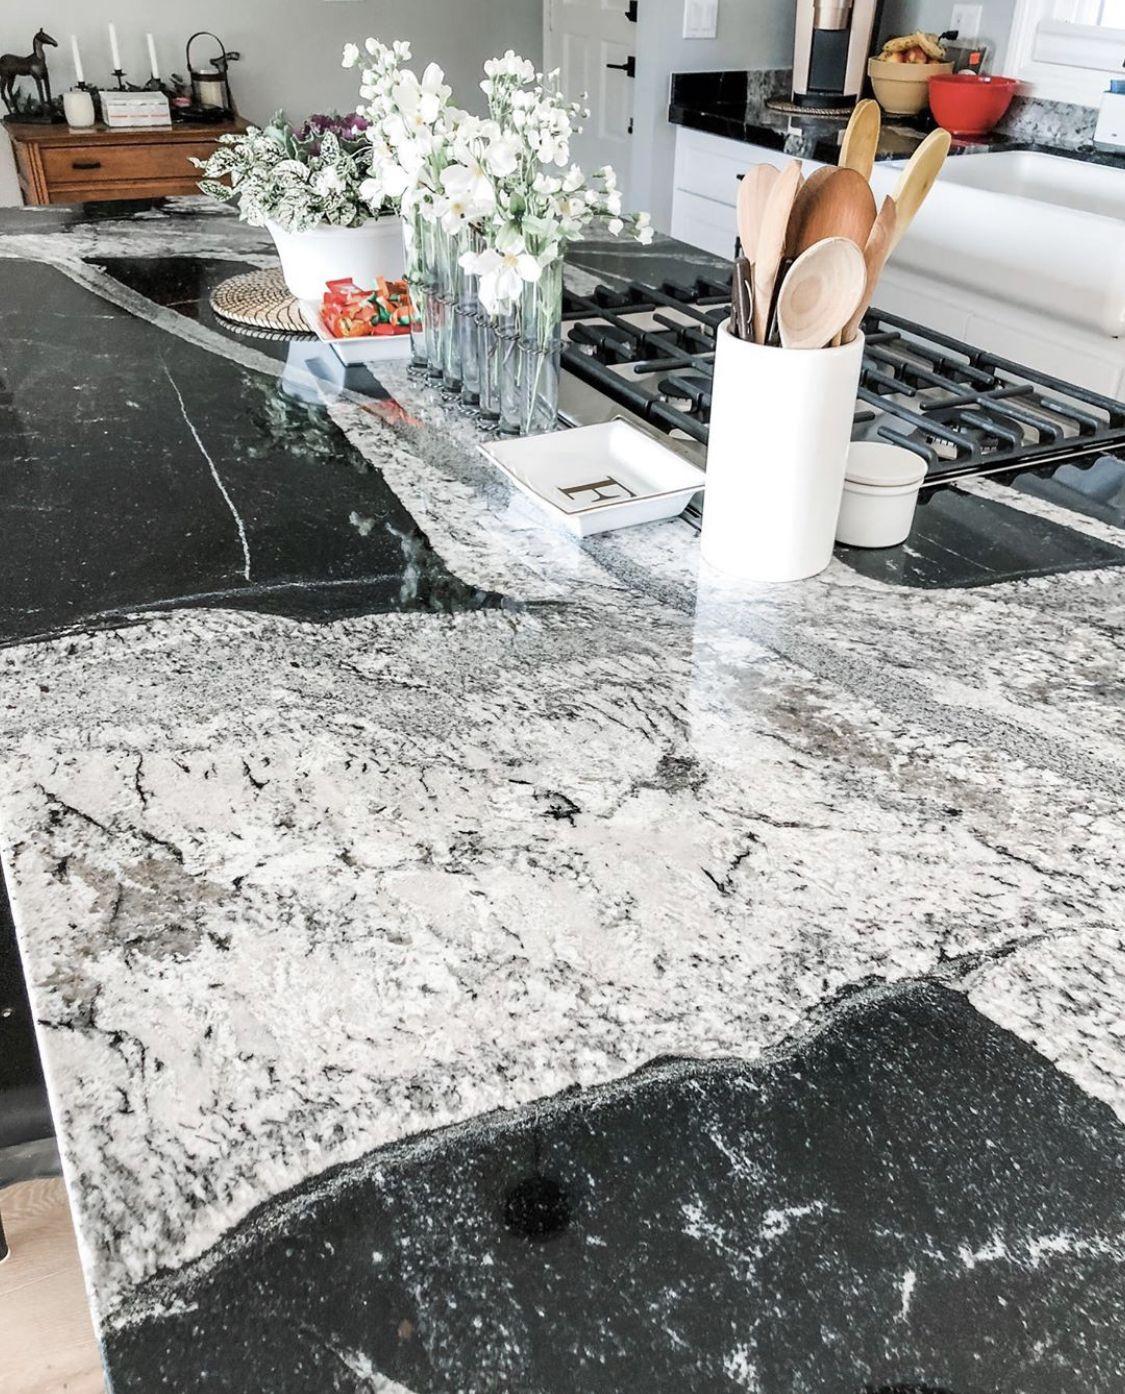 Crowe Custom Countertops In 2020 Custom Countertops Granite Countertops Engineered Stone Countertops